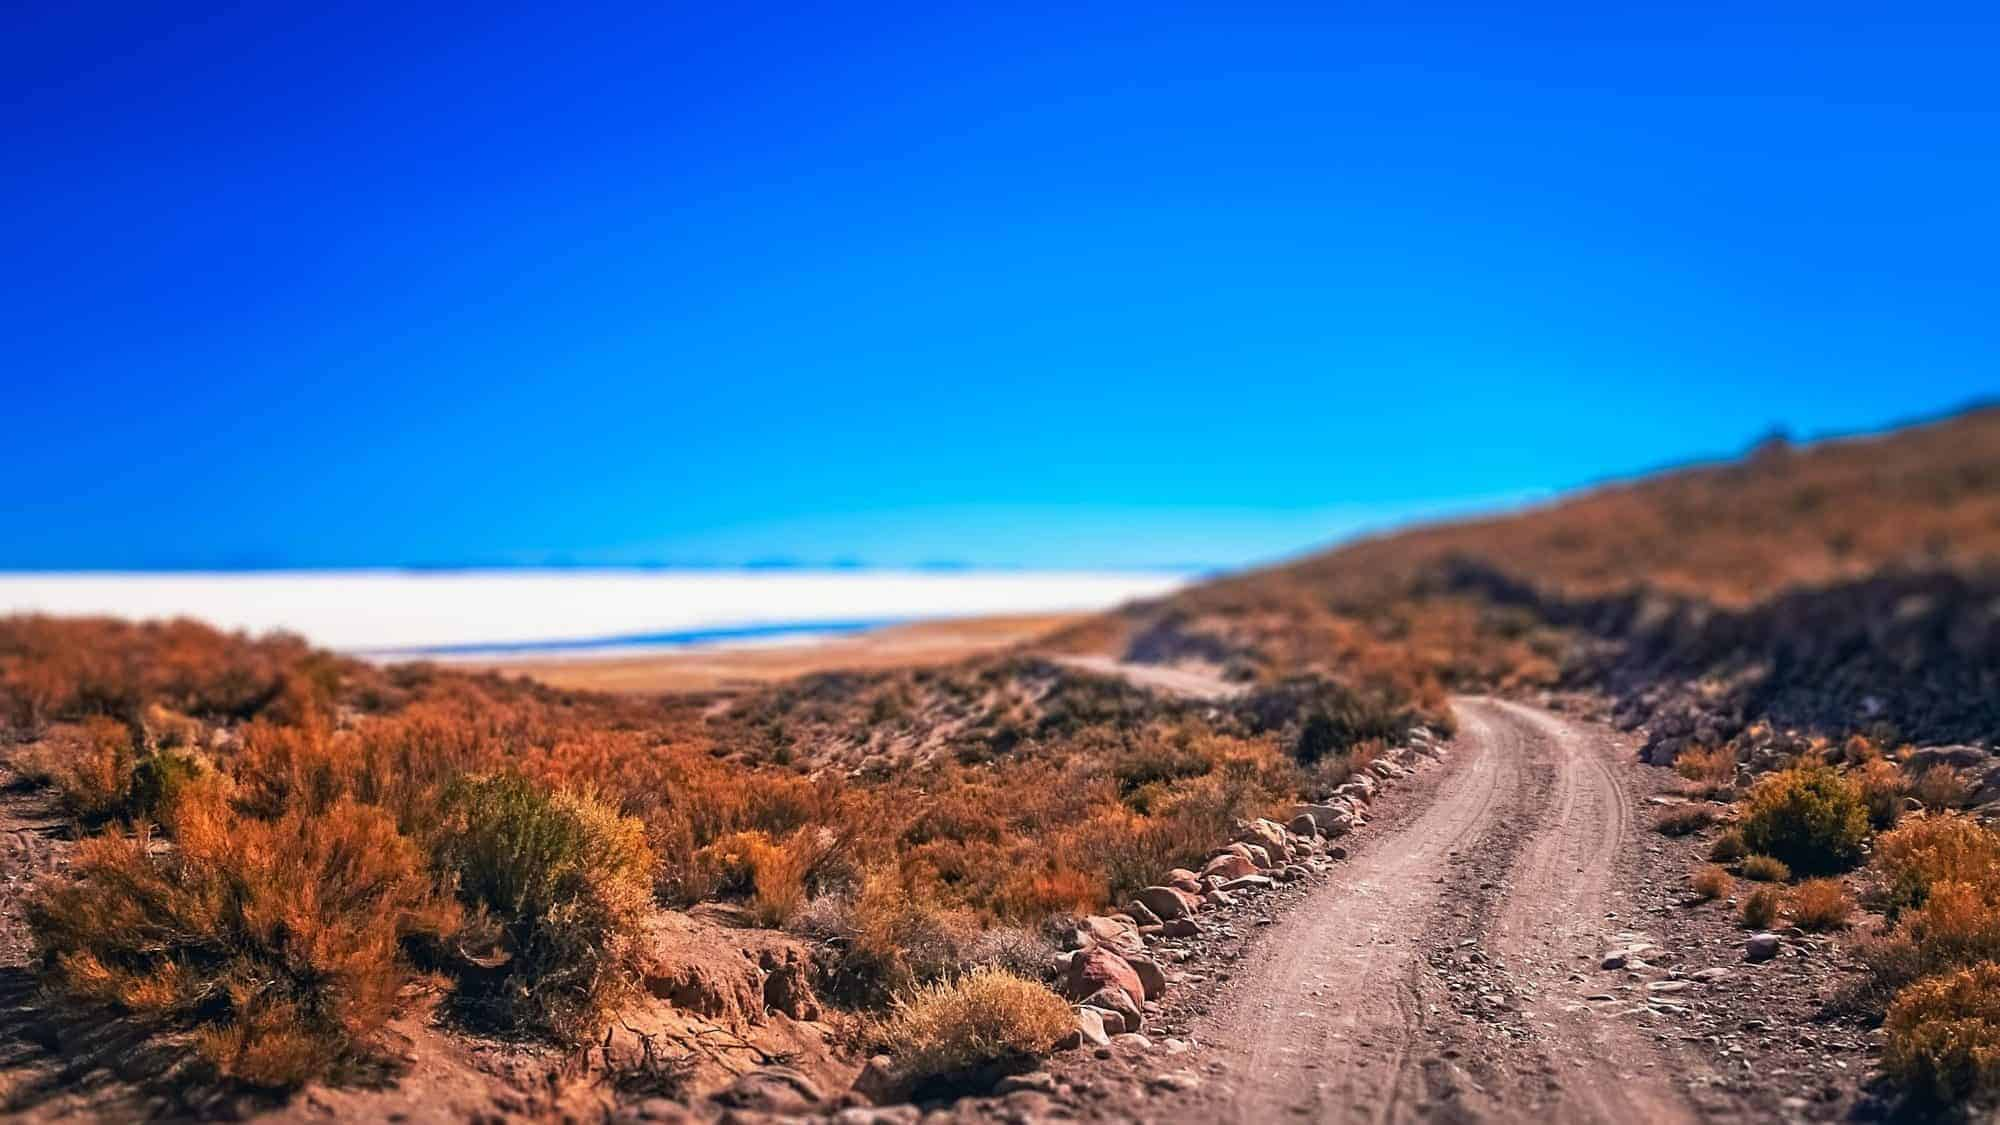 Road towards Salar de Uyuni